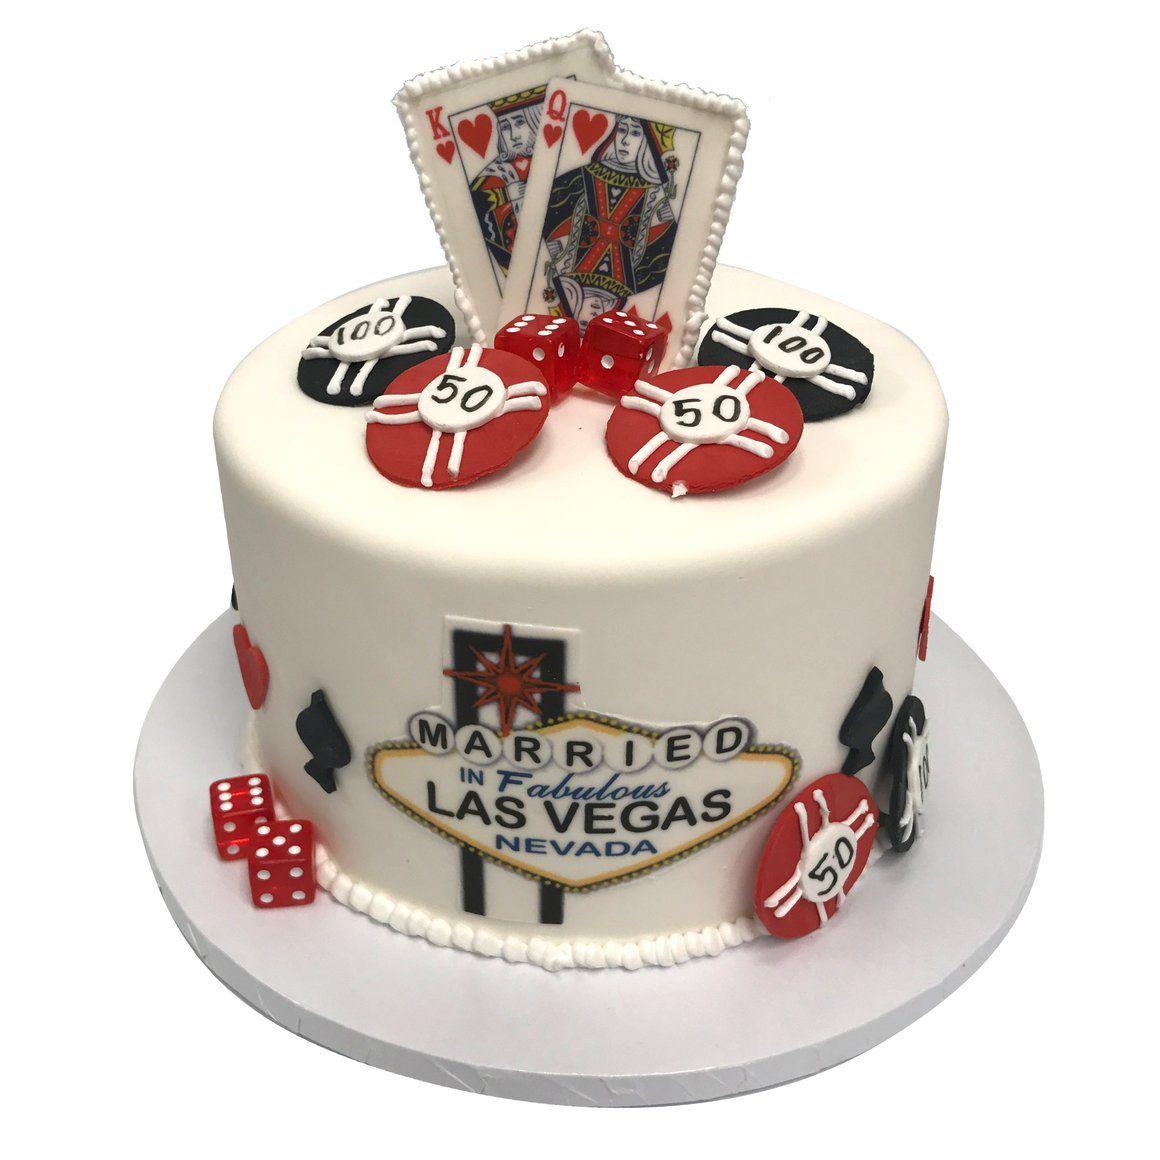 Las Vegas Cakes Freeds Bakery